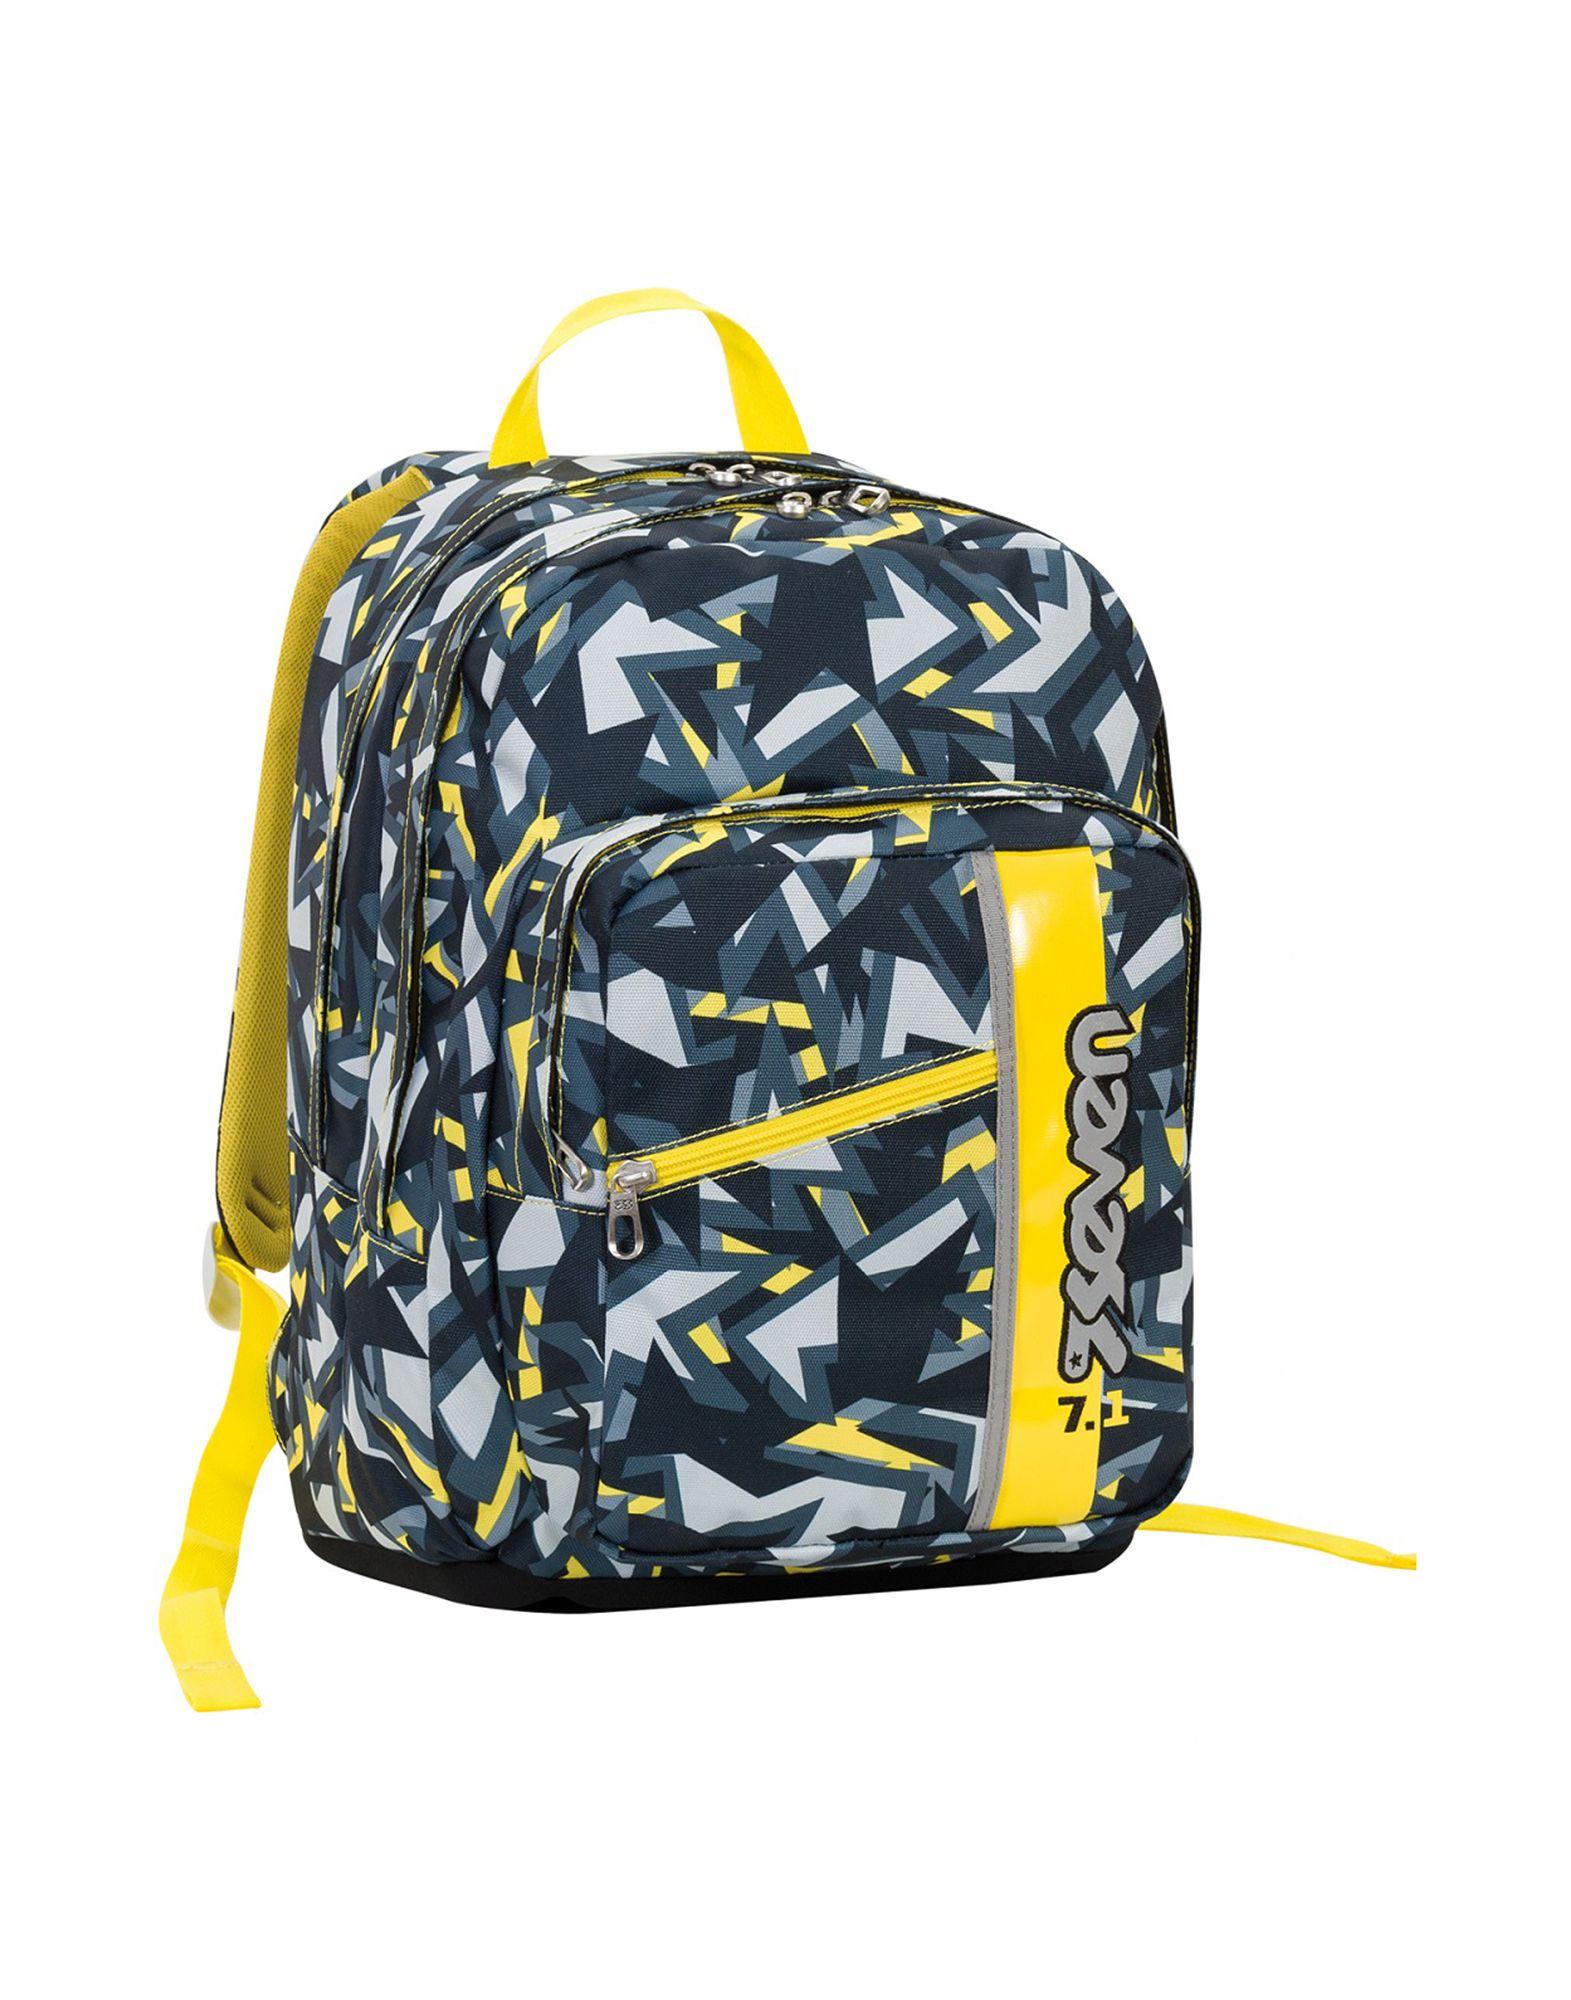 SEVEN Рюкзаки и сумки на пояс дюна сумки и рюкзаки